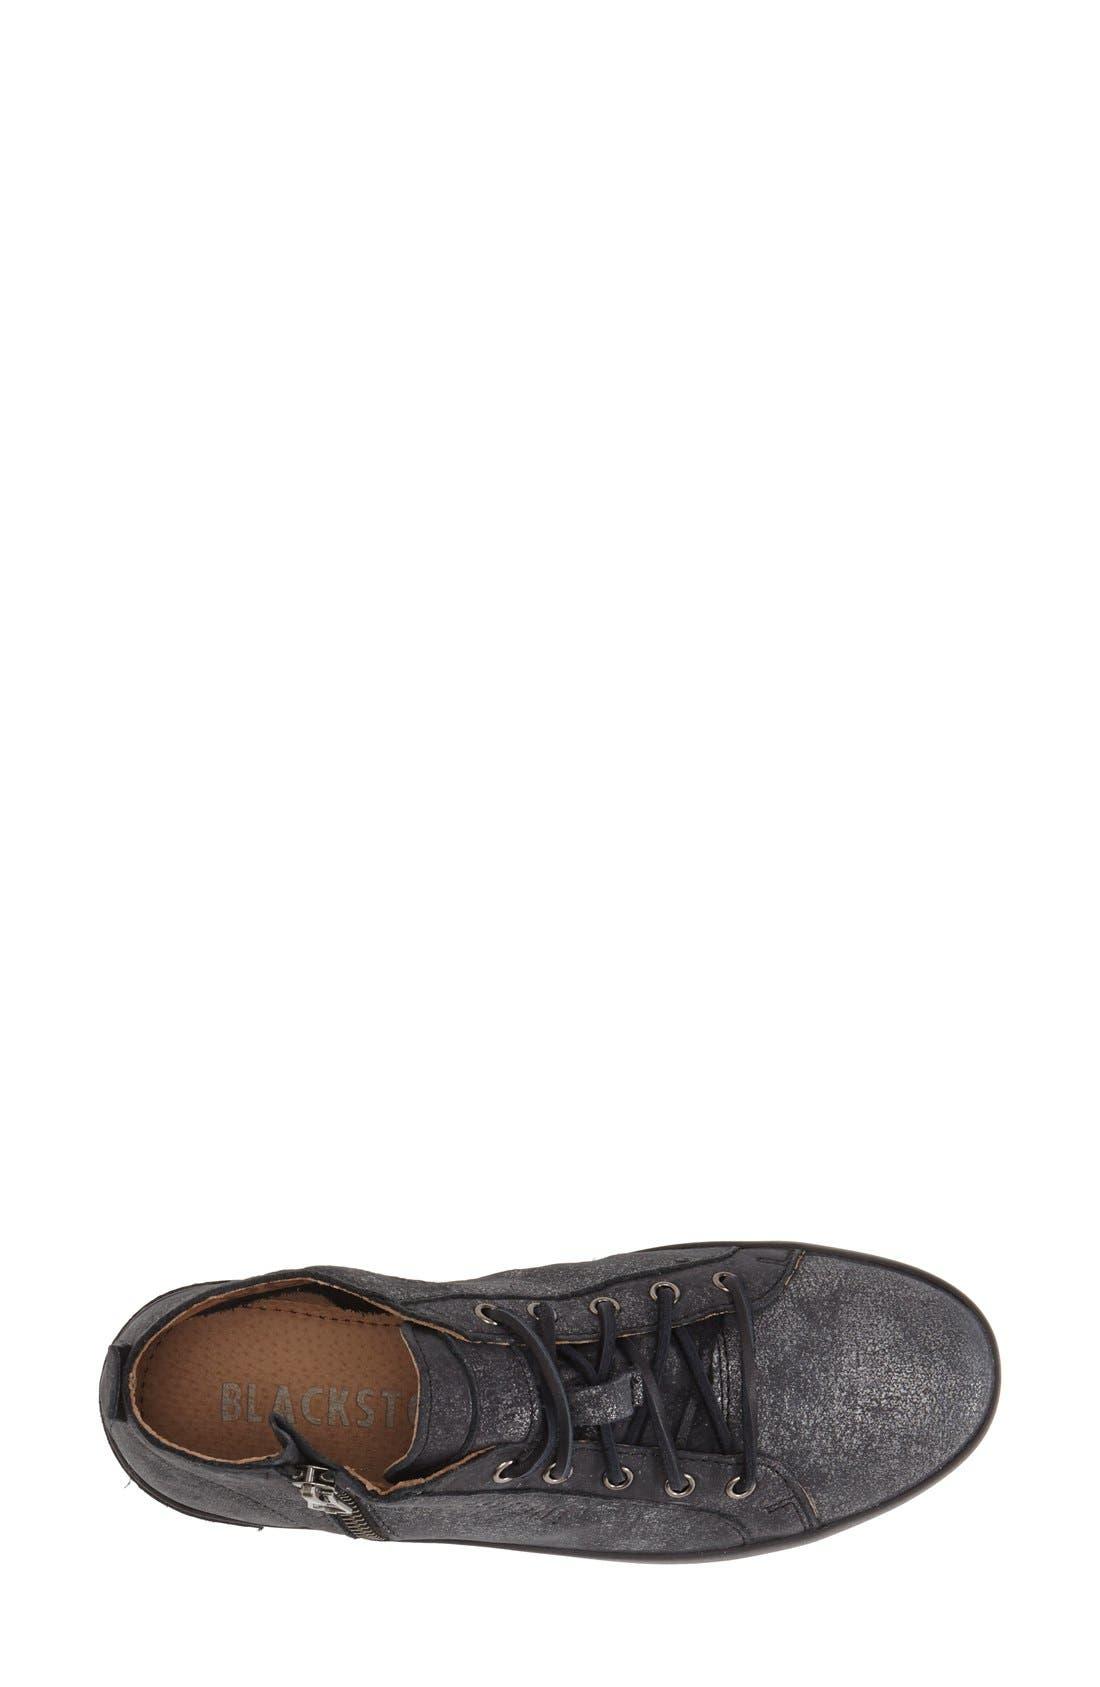 BLACKSTONE,                             'JL17' Sneaker,                             Alternate thumbnail 3, color,                             BLACK METALLIC